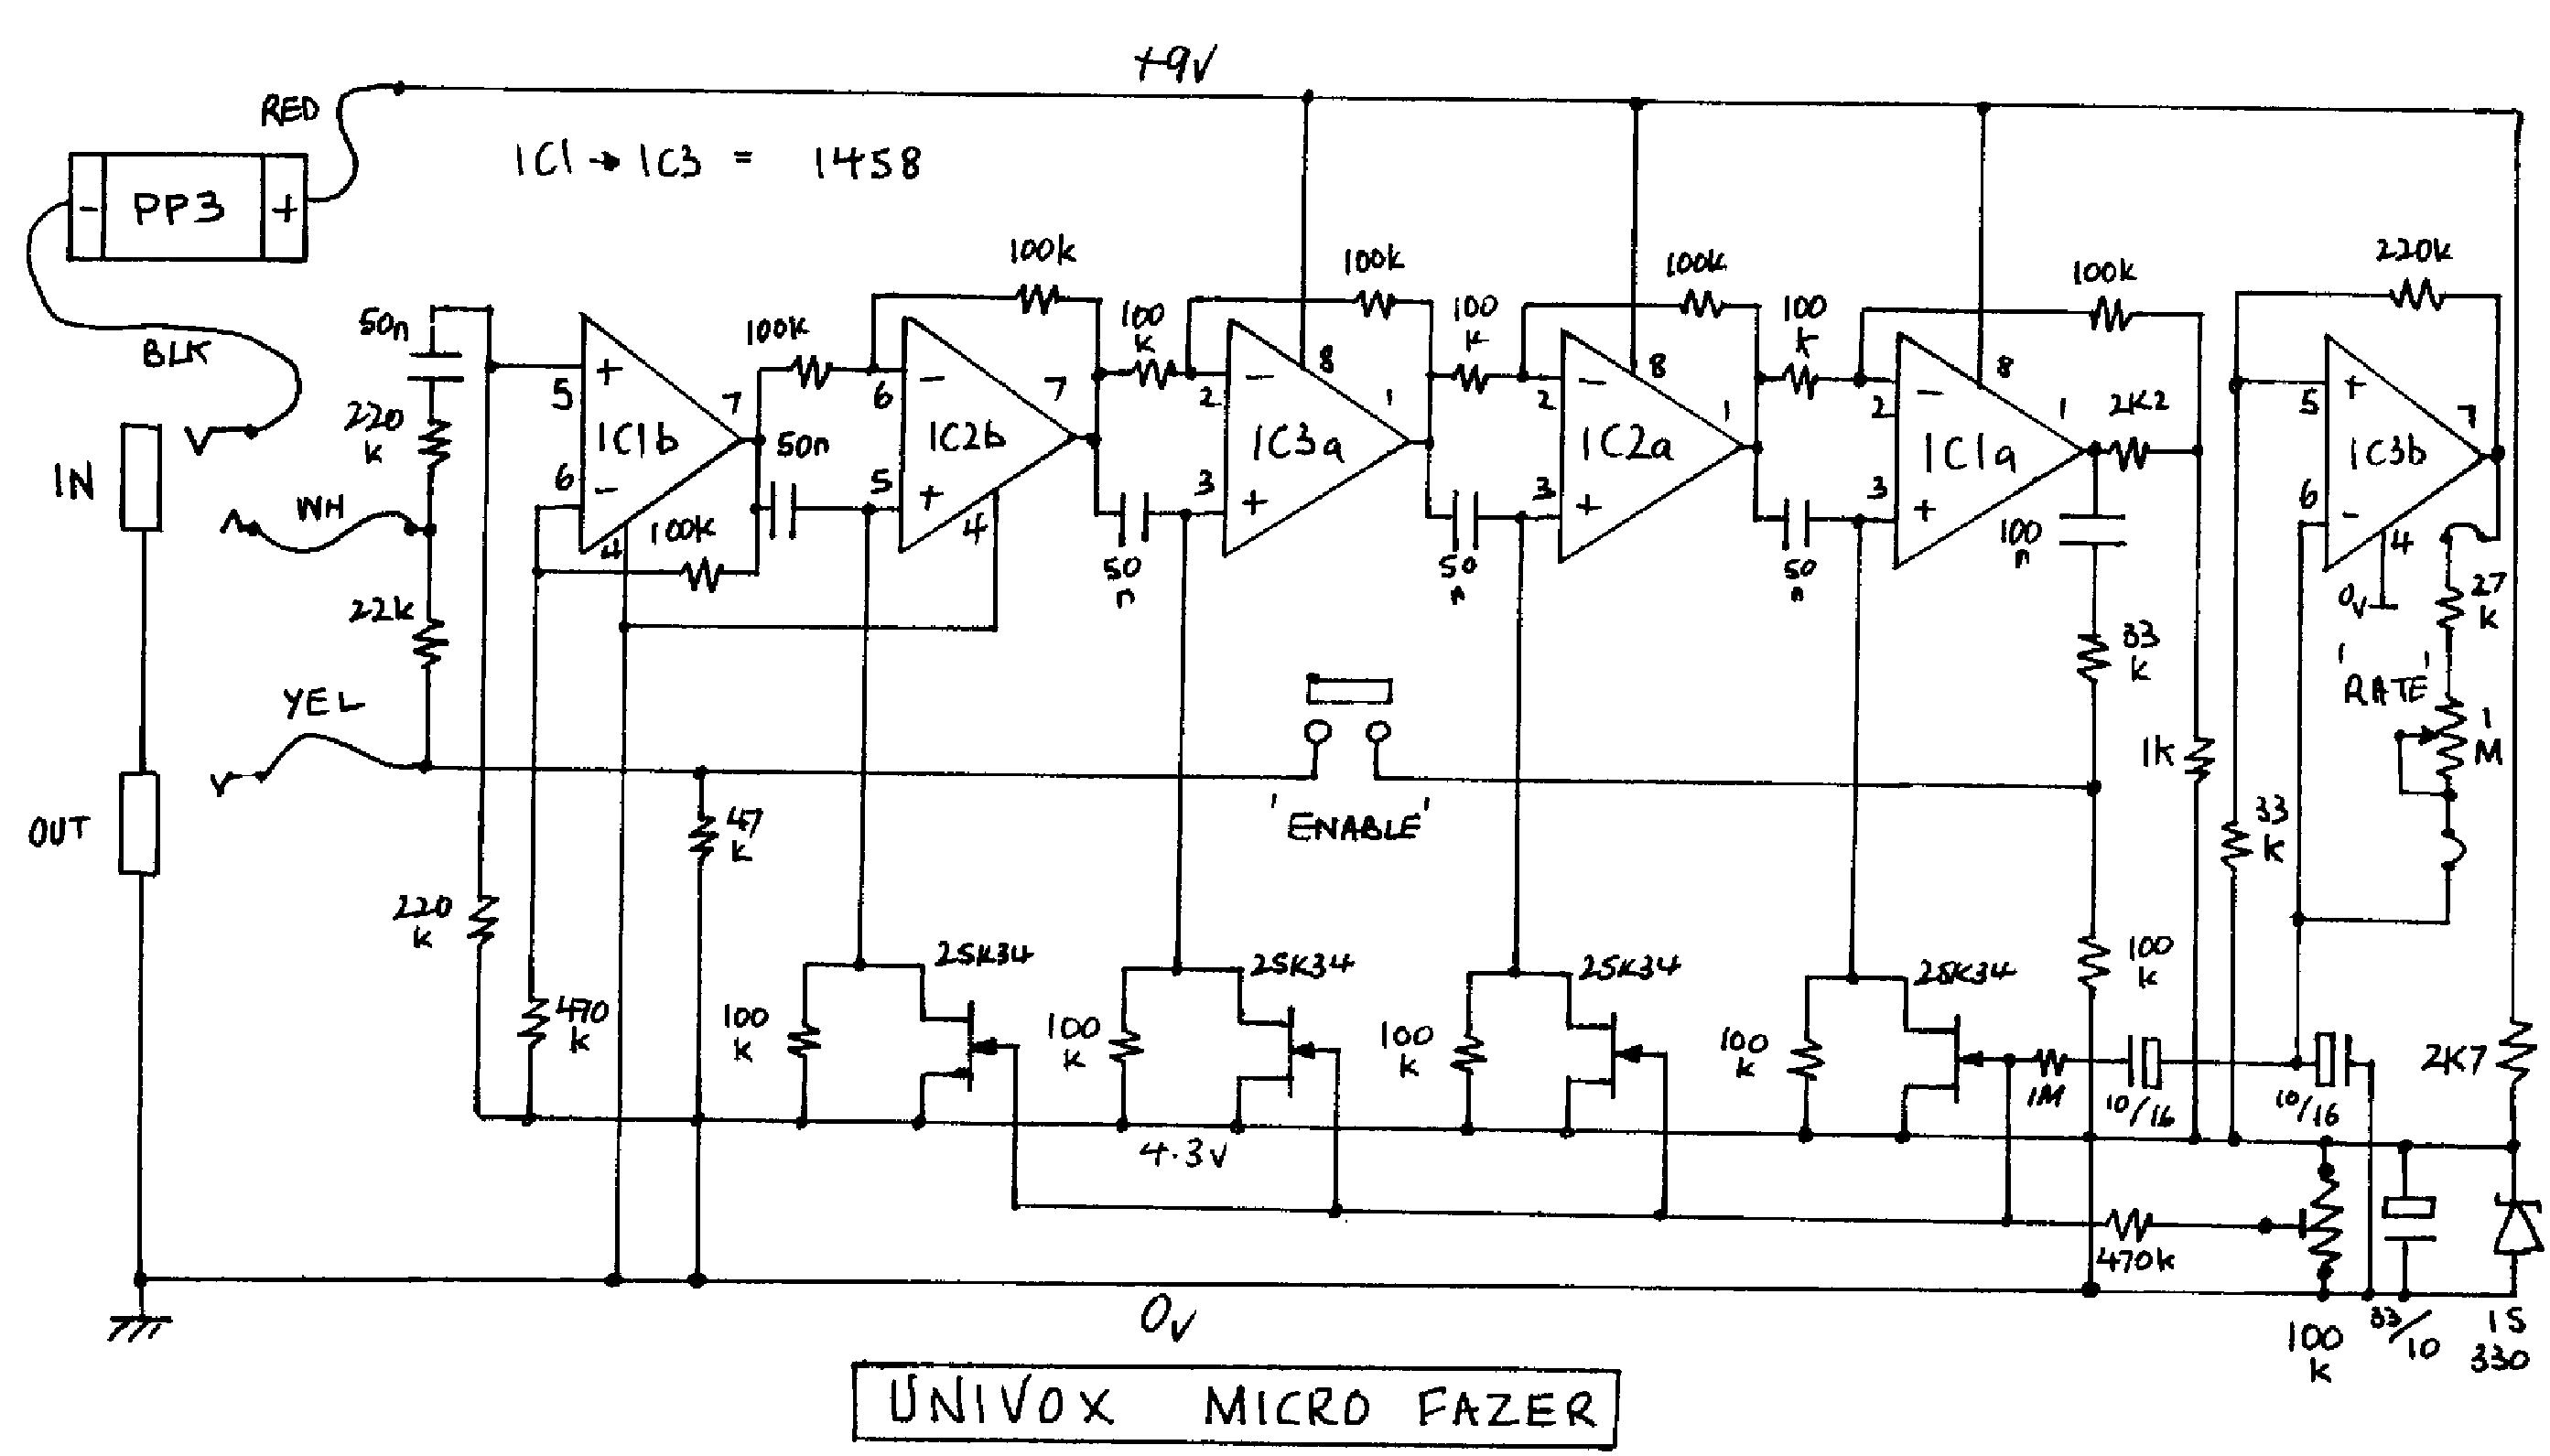 Univox U 1001 Schematic Circuit Boards Wiring Diagrams Super Fuzz Eeprom Microfazer Sch Service Manual Download Schematics Amp